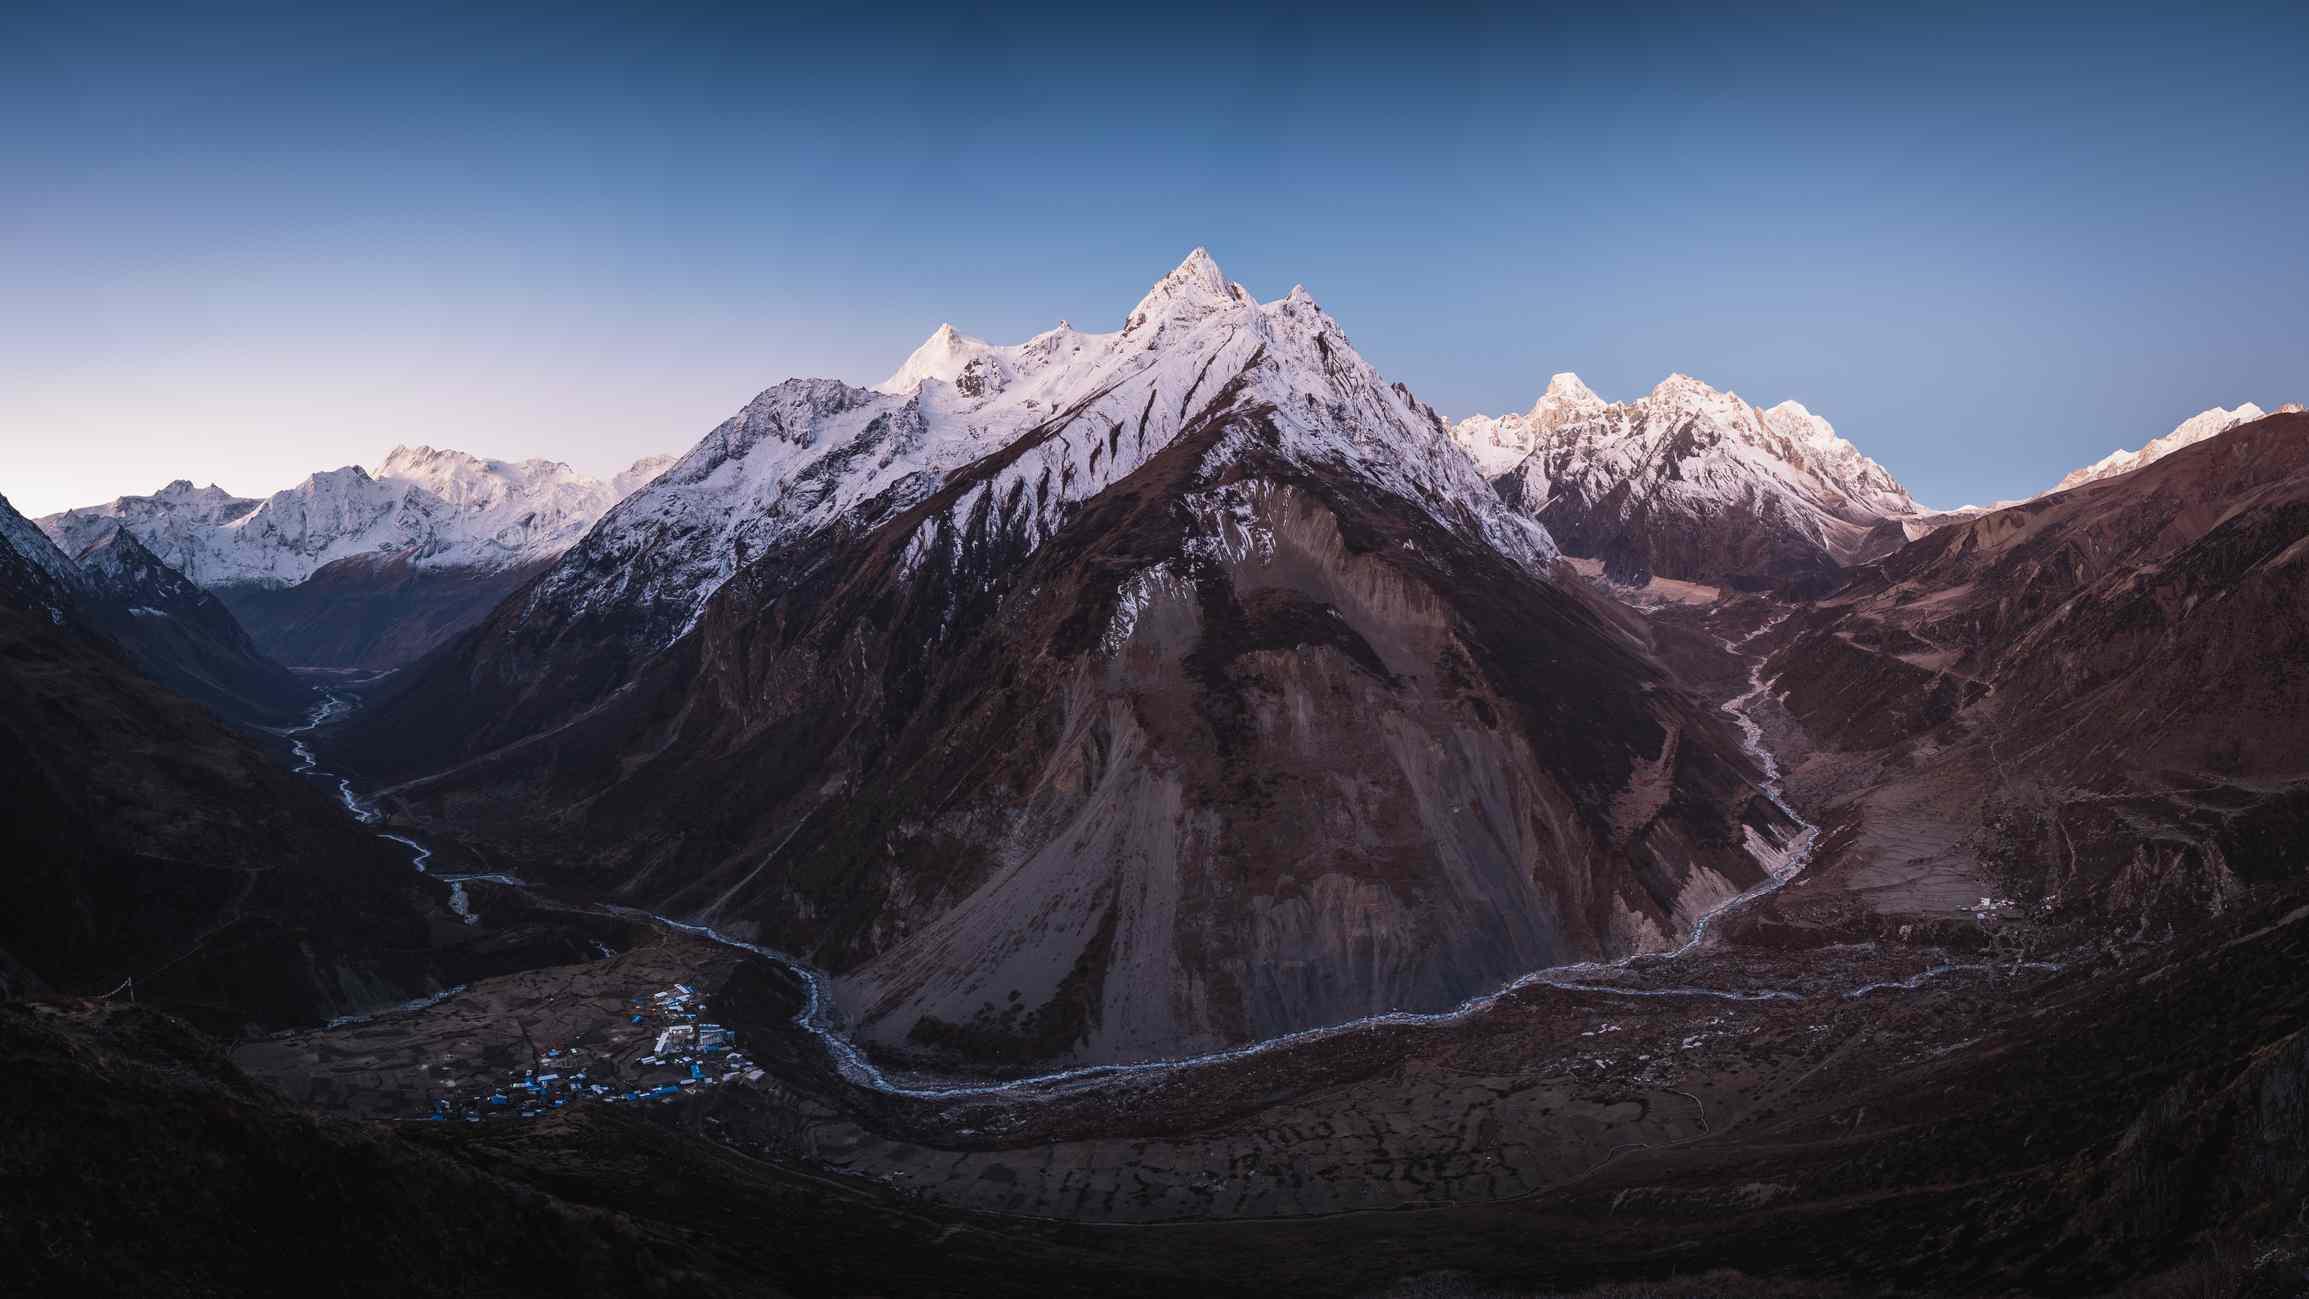 Manaslu mountain from Samdo Ri in Nepal